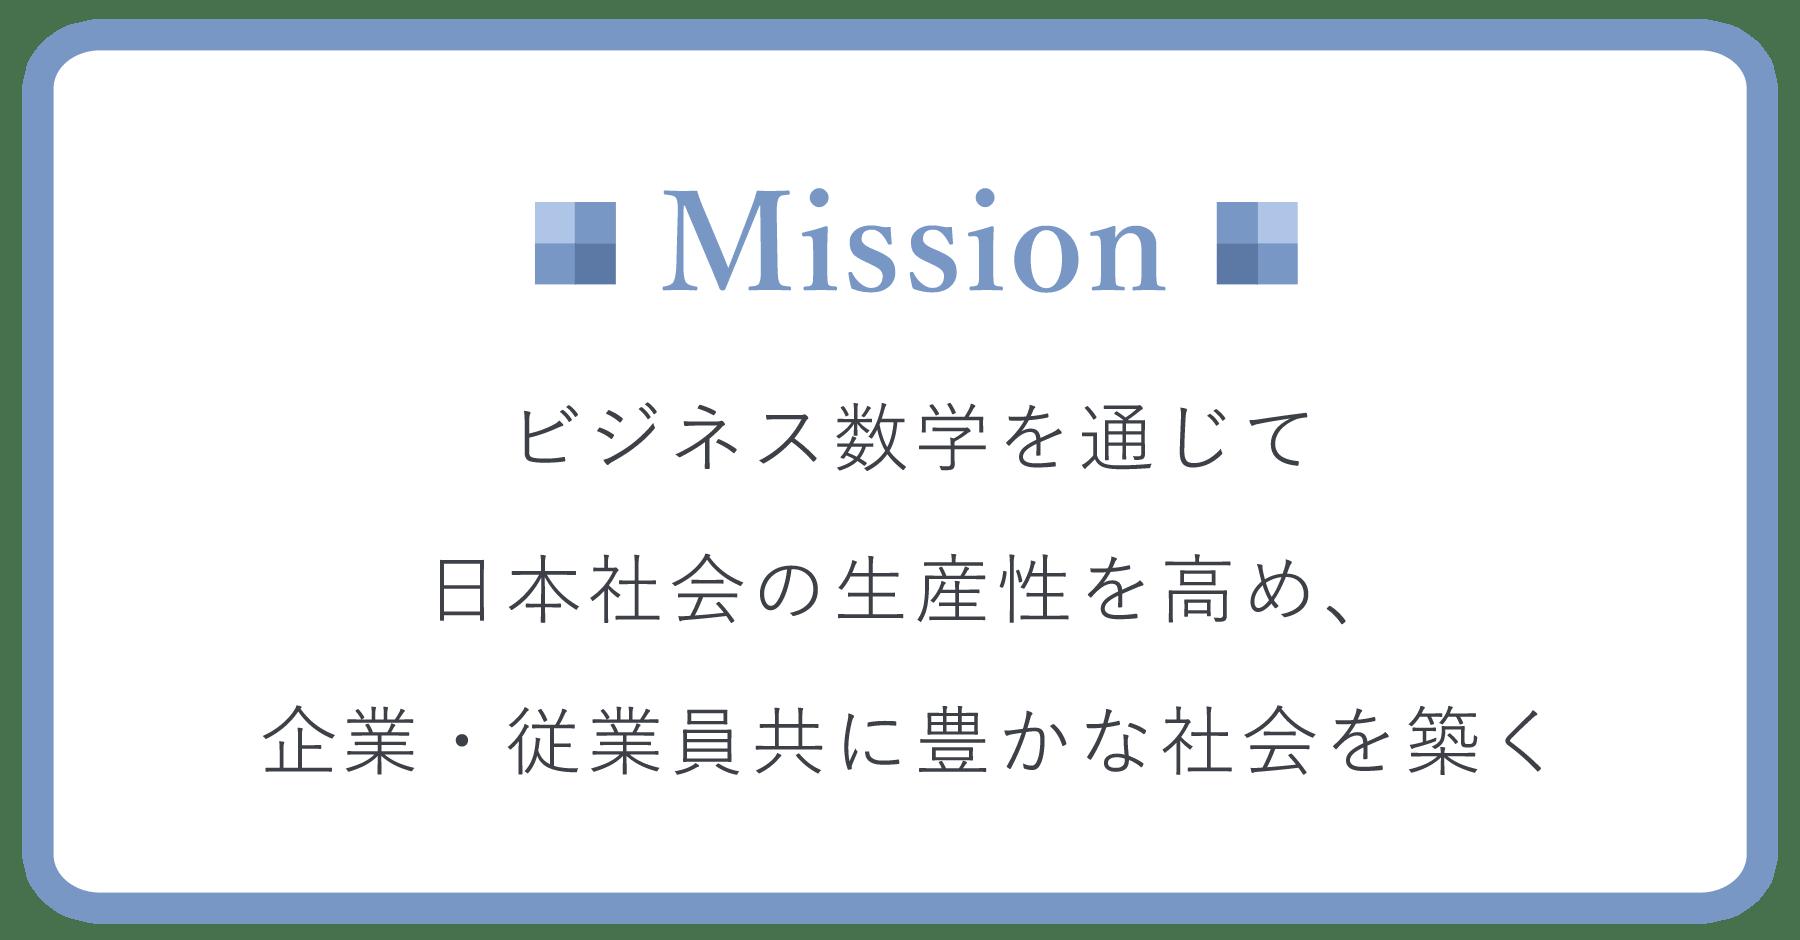 会社方針:MISSION